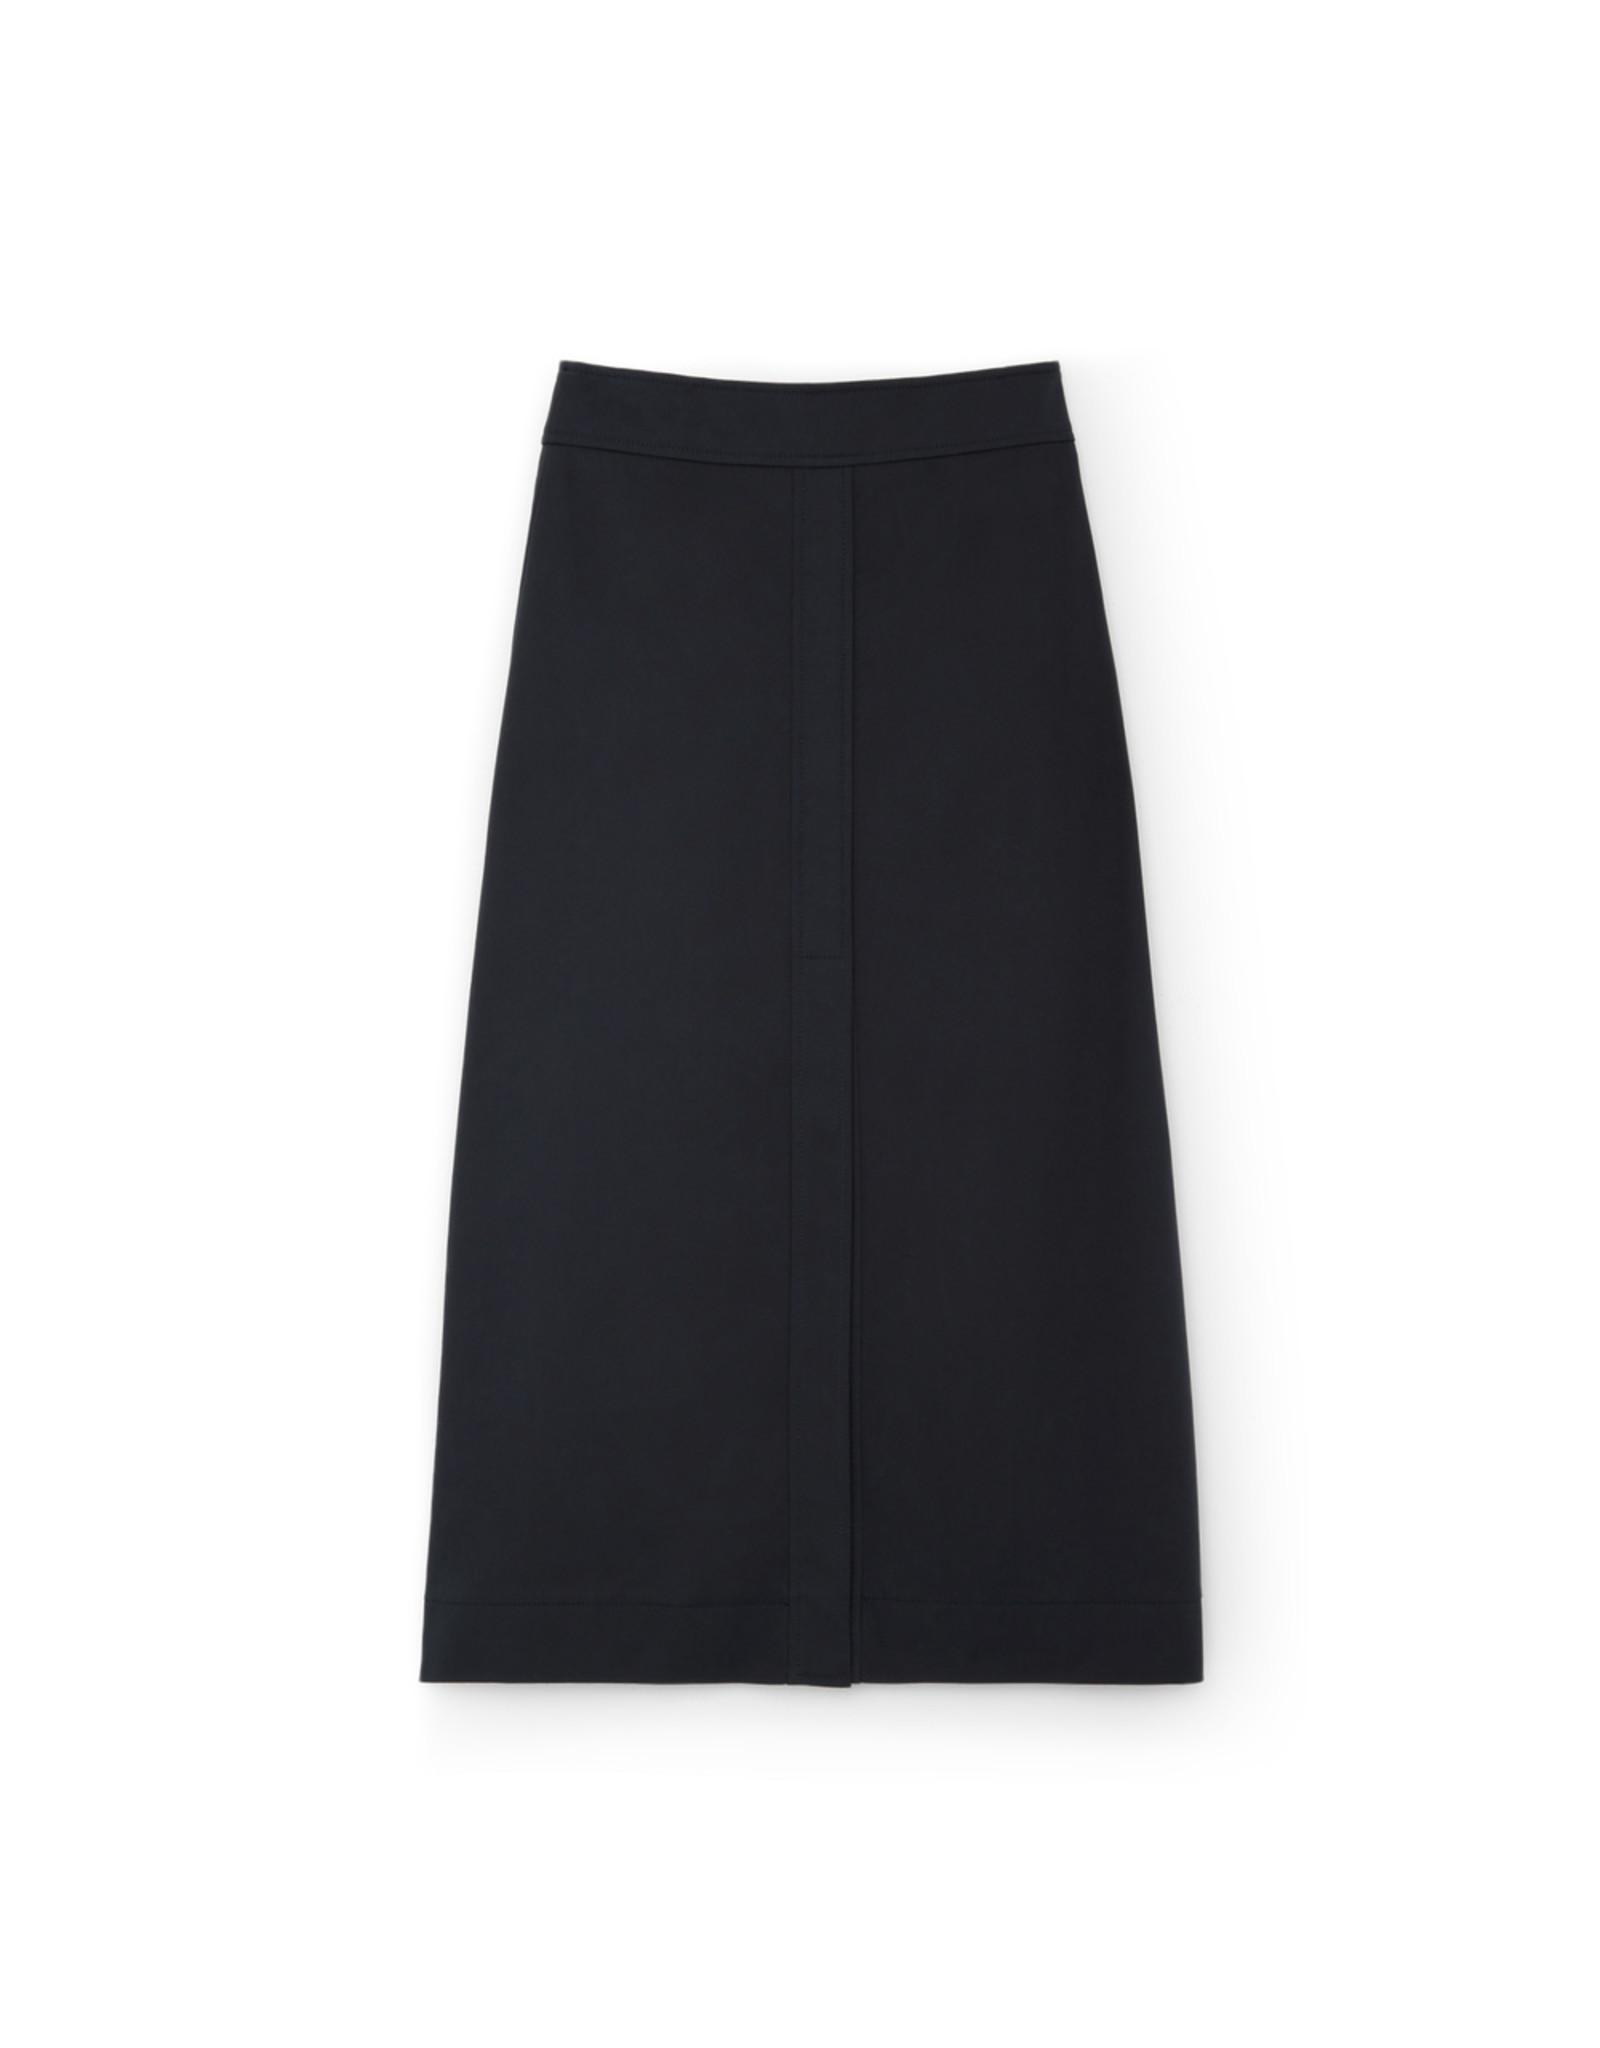 G. Label G. Label Stewart A-Line Cotton Skirt (Color: Navy, Size: 10)